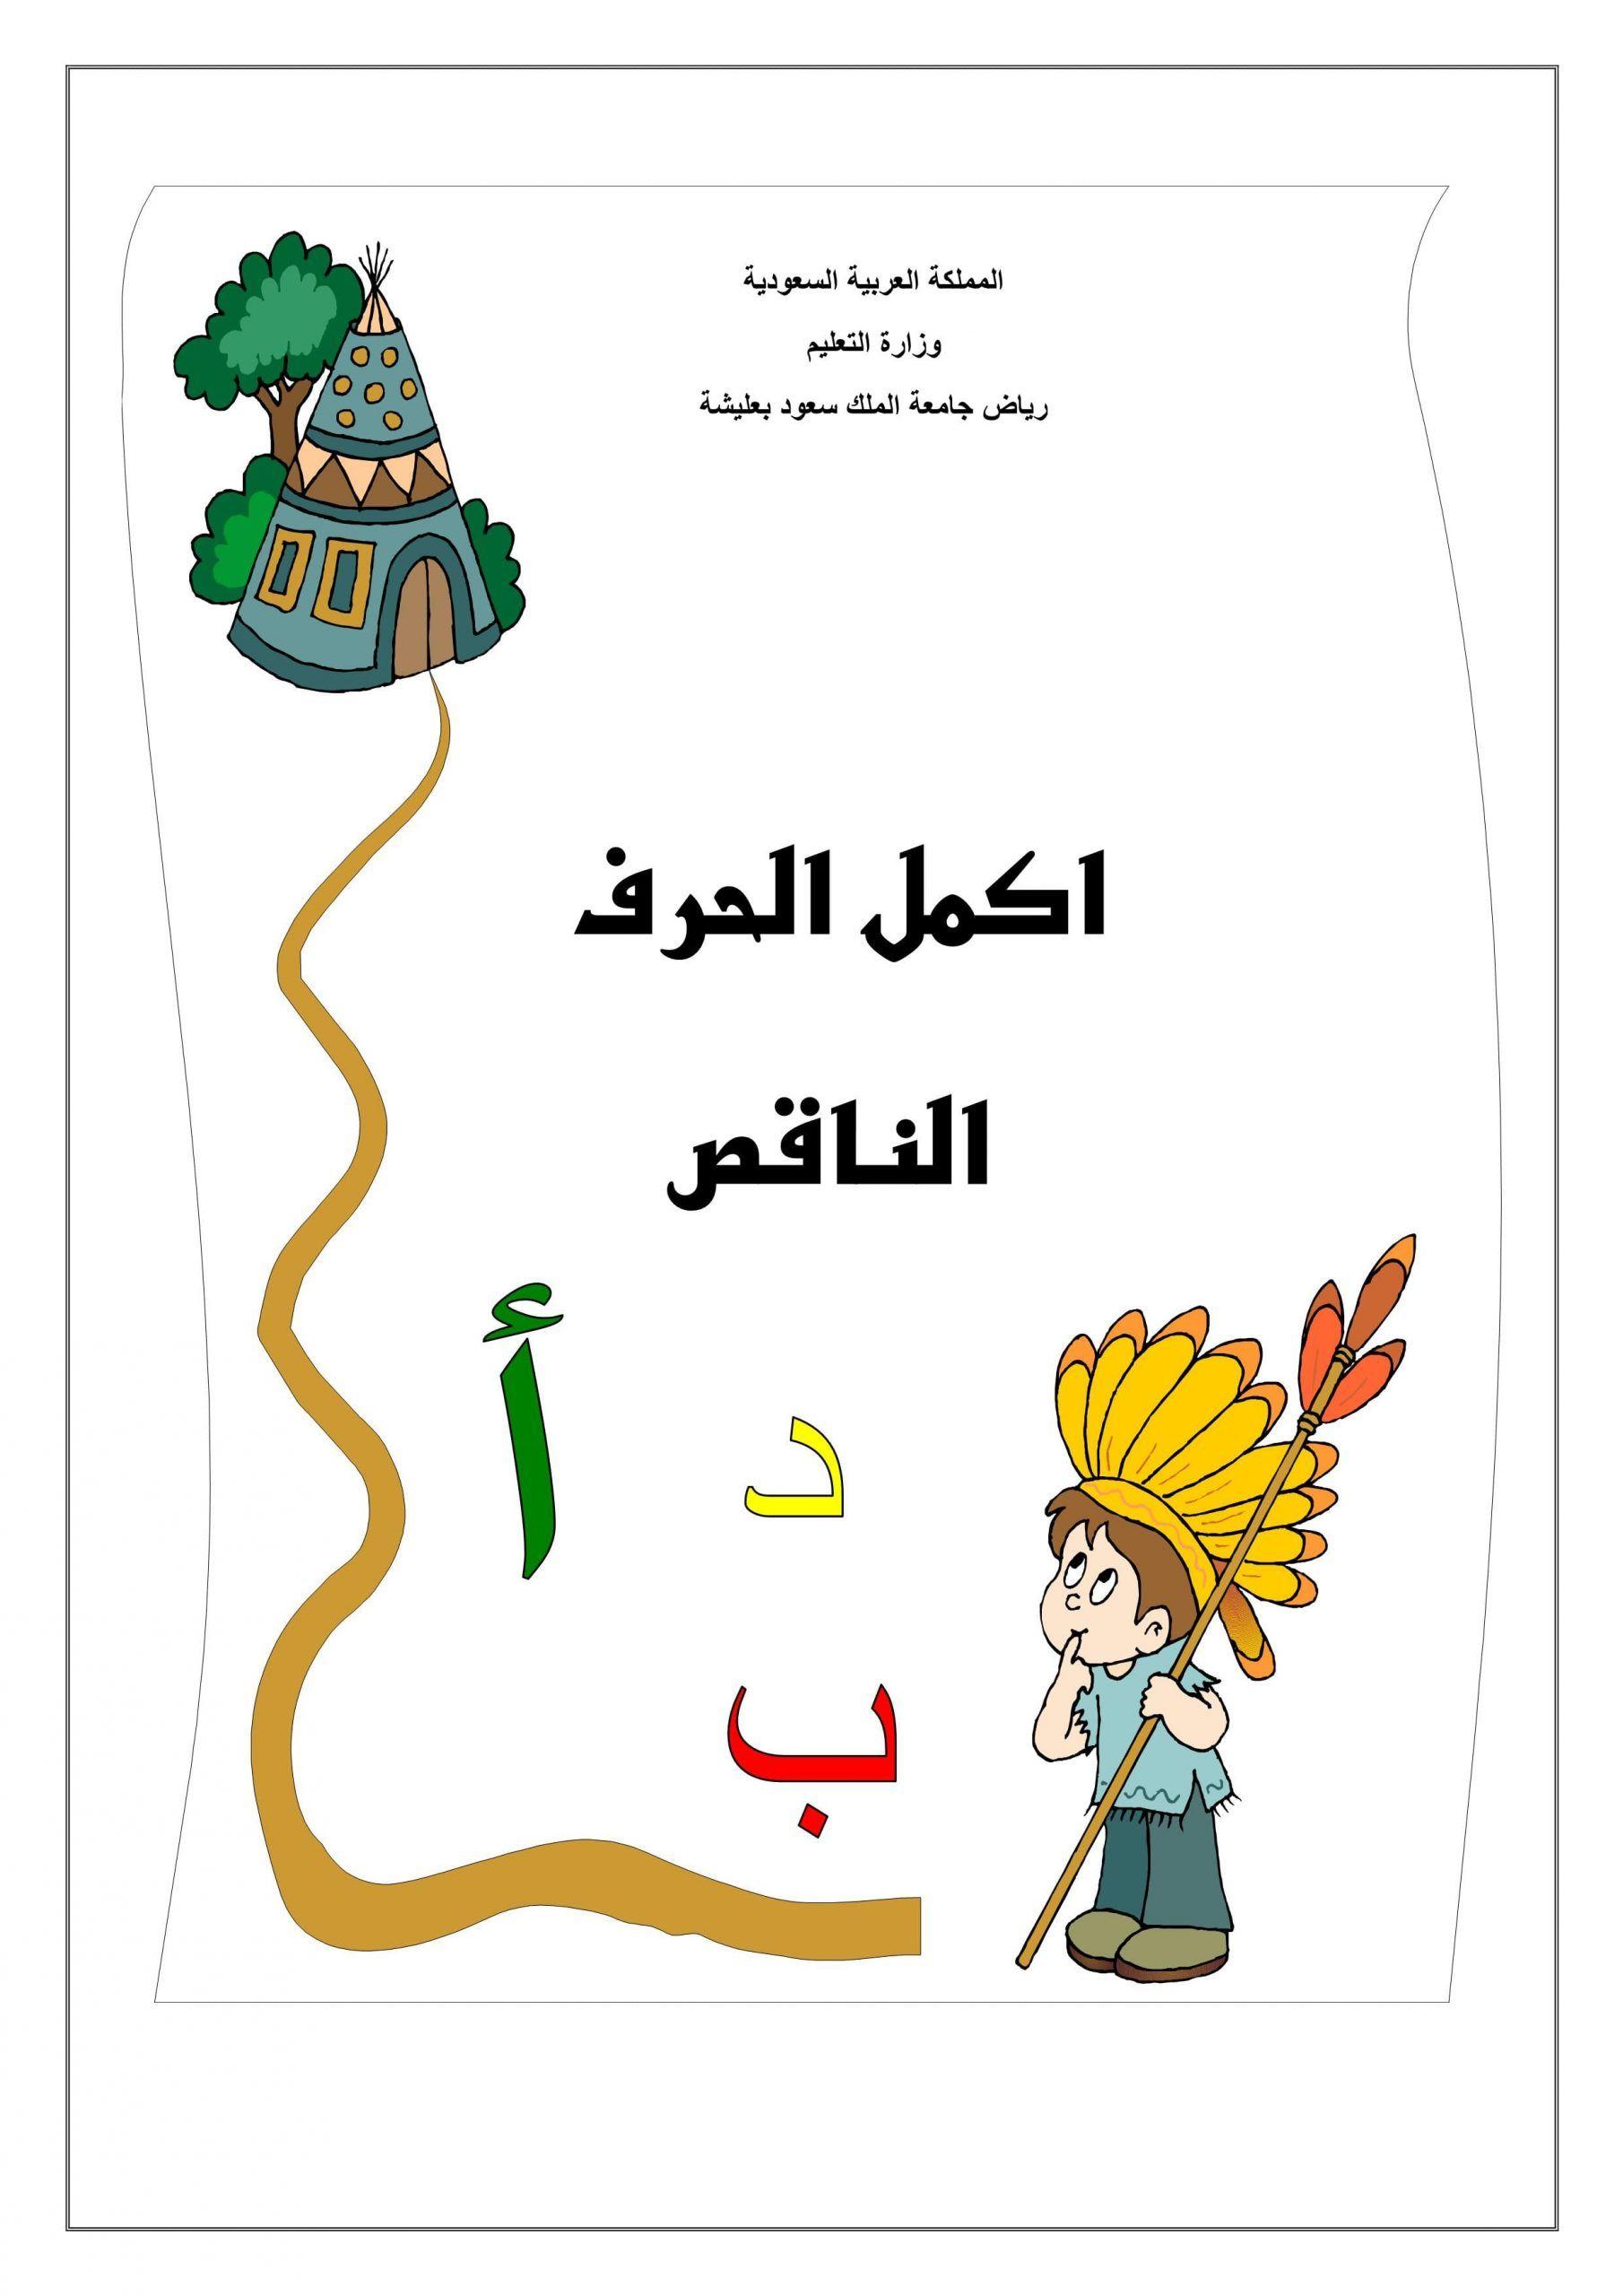 تدريبات للاطفال اكمل الحرف الناقص بشكل ممتع ومفيد Character Fictional Characters Snoopy